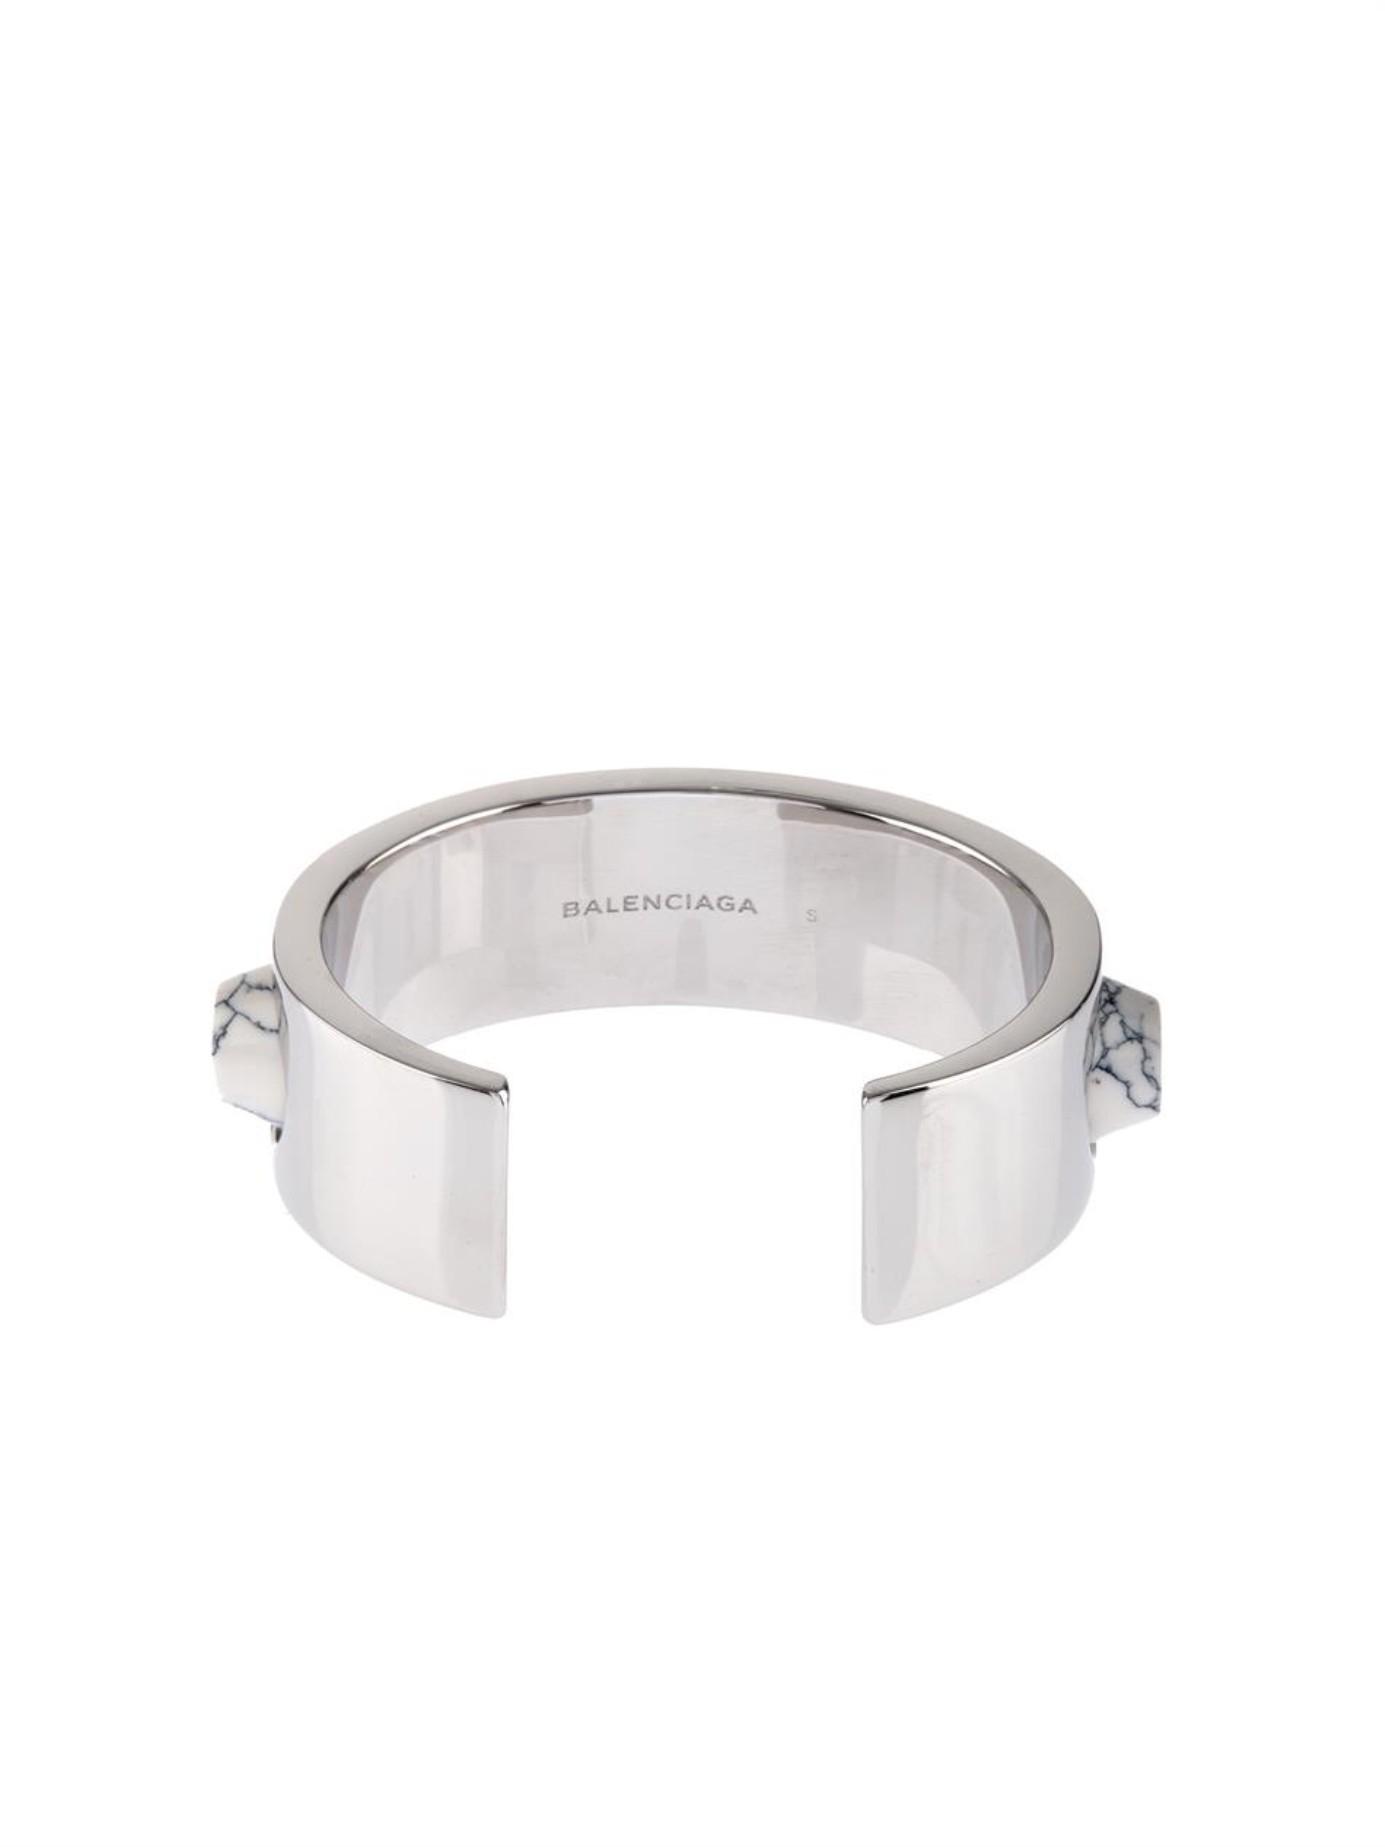 Balenciaga Denim Marble Arena Stud Cuff in Silver (Metallic)